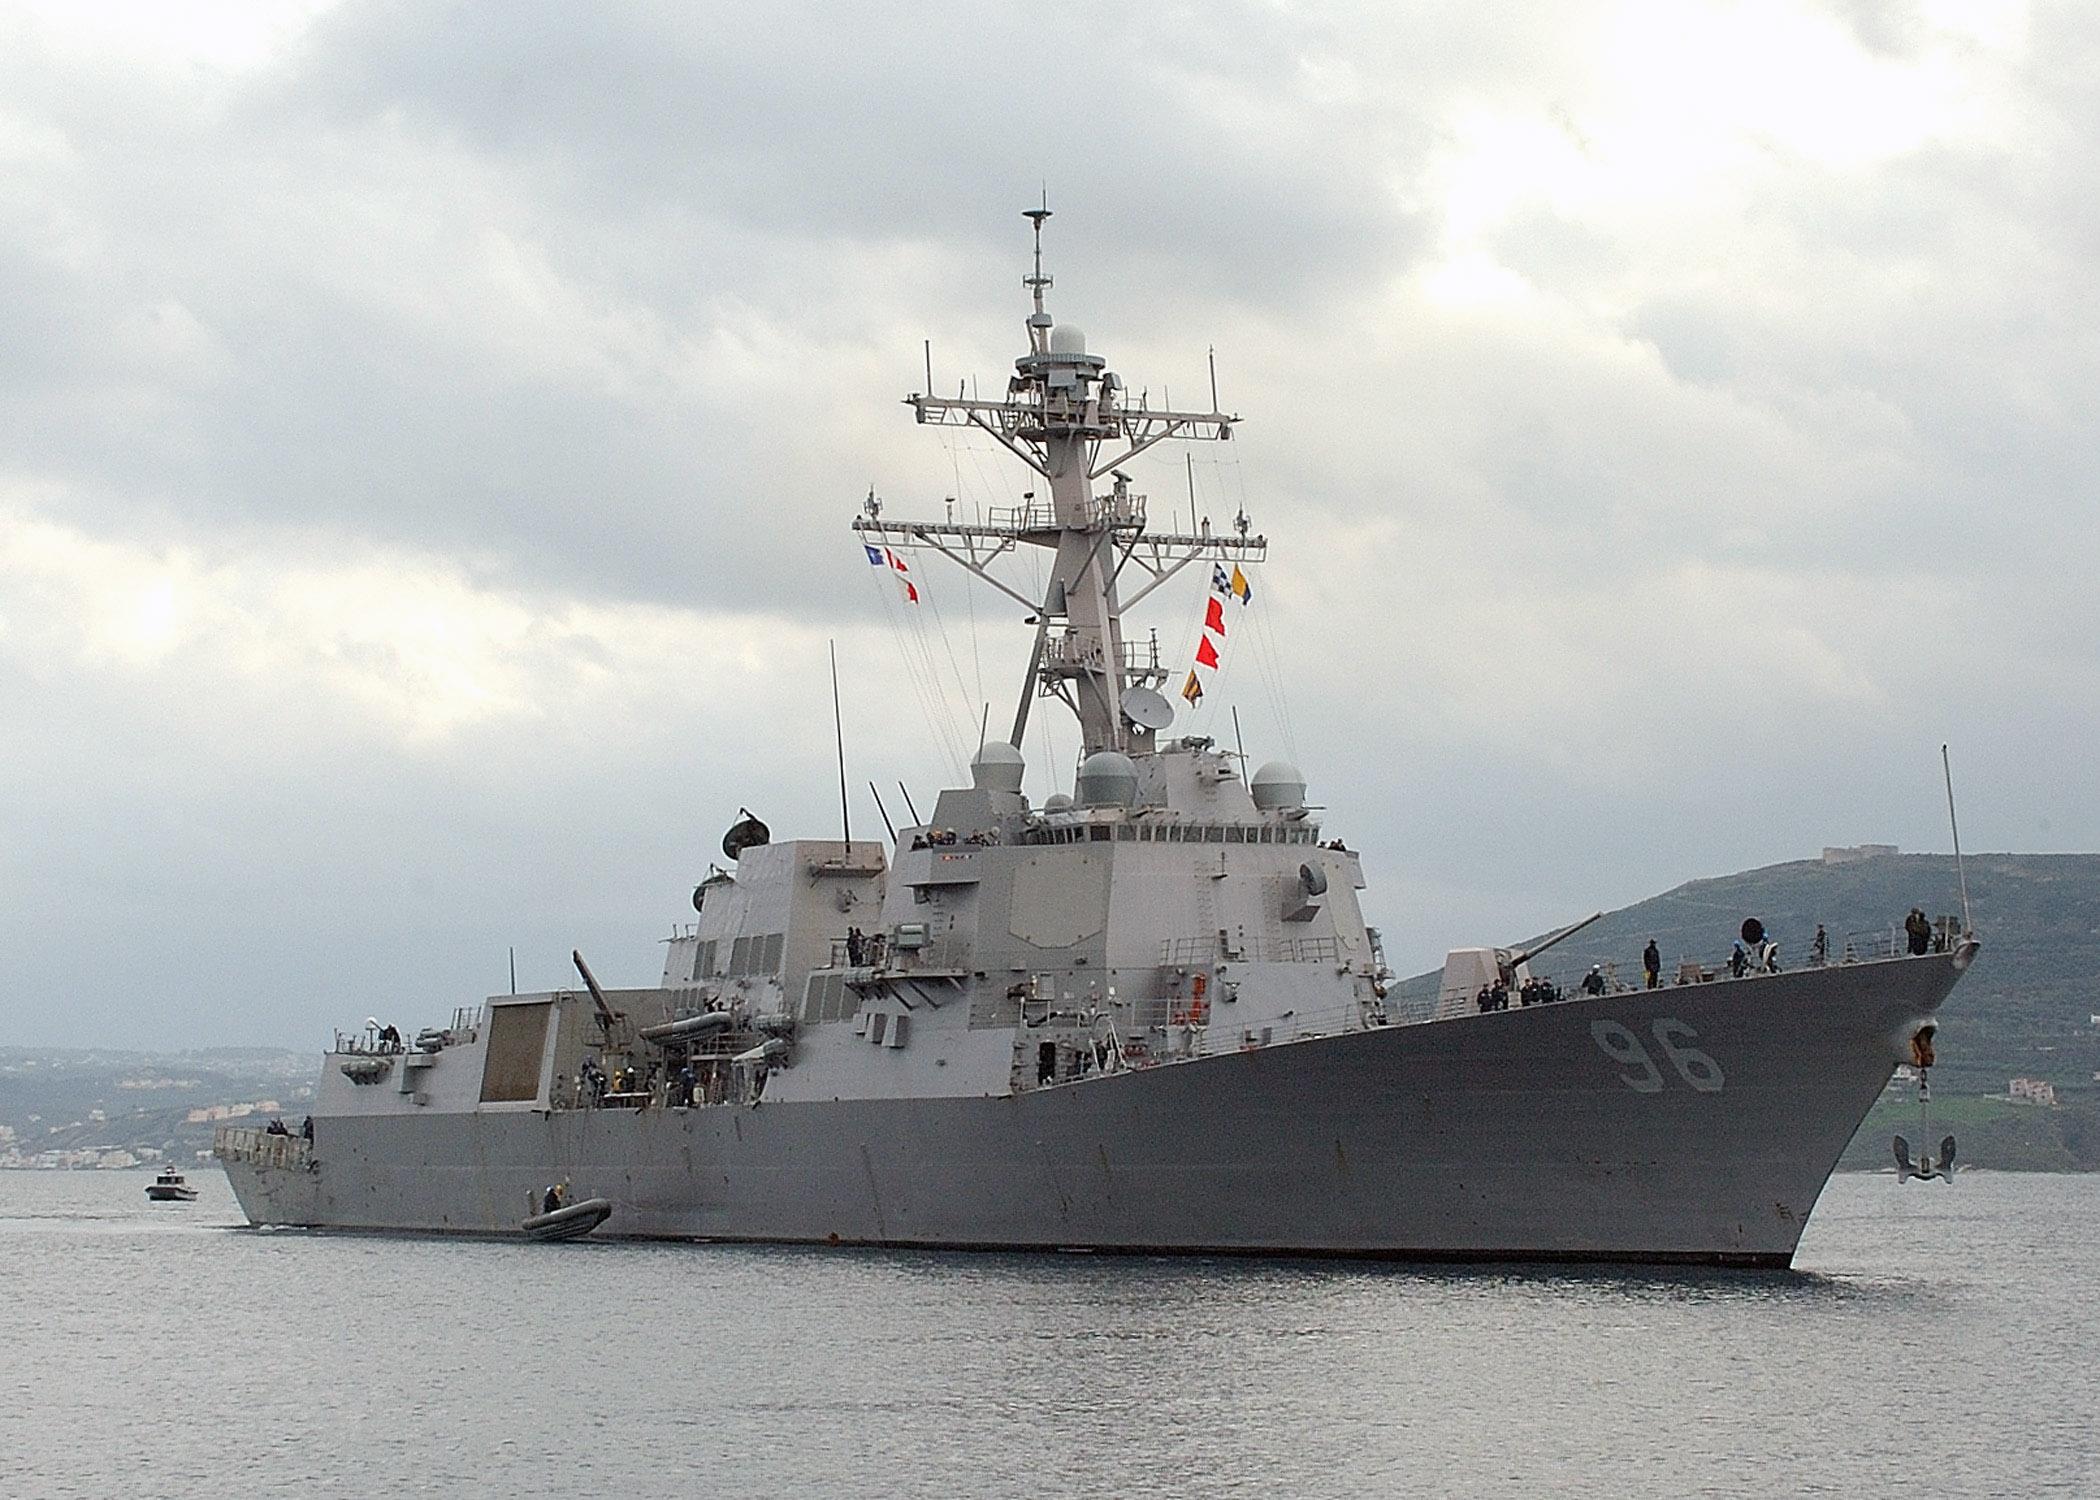 USS Bainbridge (DDG 96) arrives at NATO Pier Facility in Souda harbour